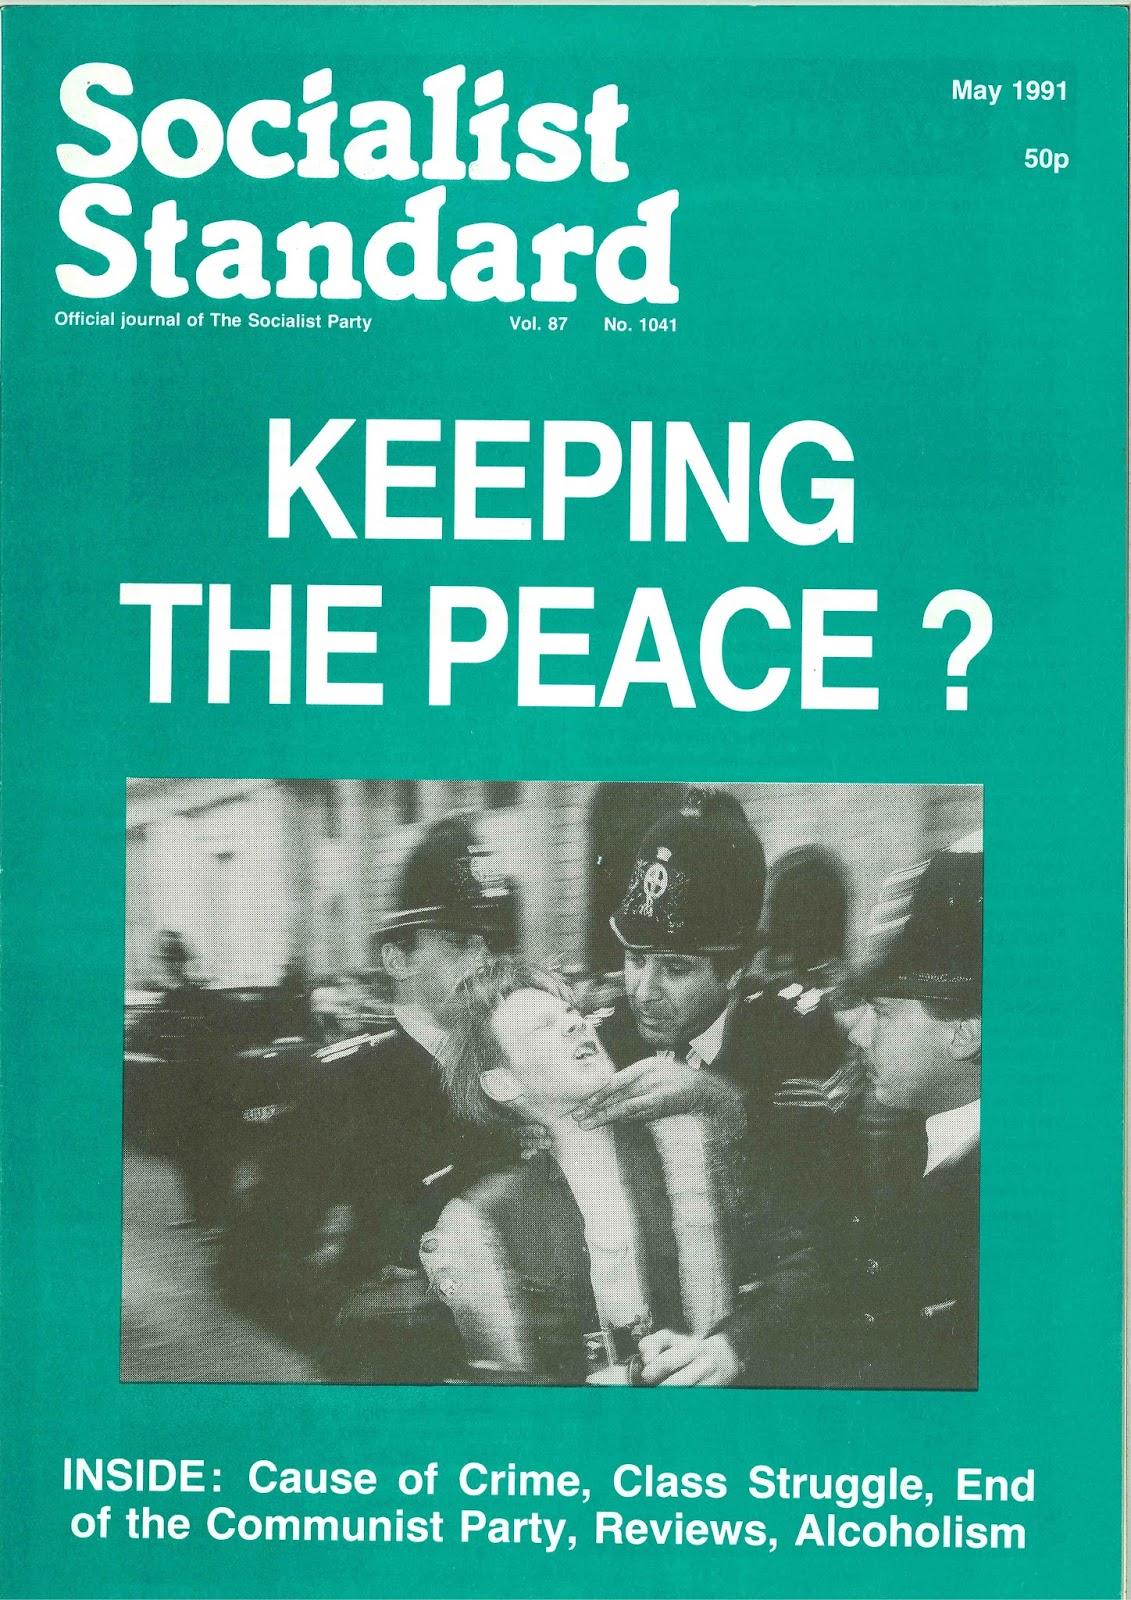 Socialist Standard Past & Present: 06/05/16